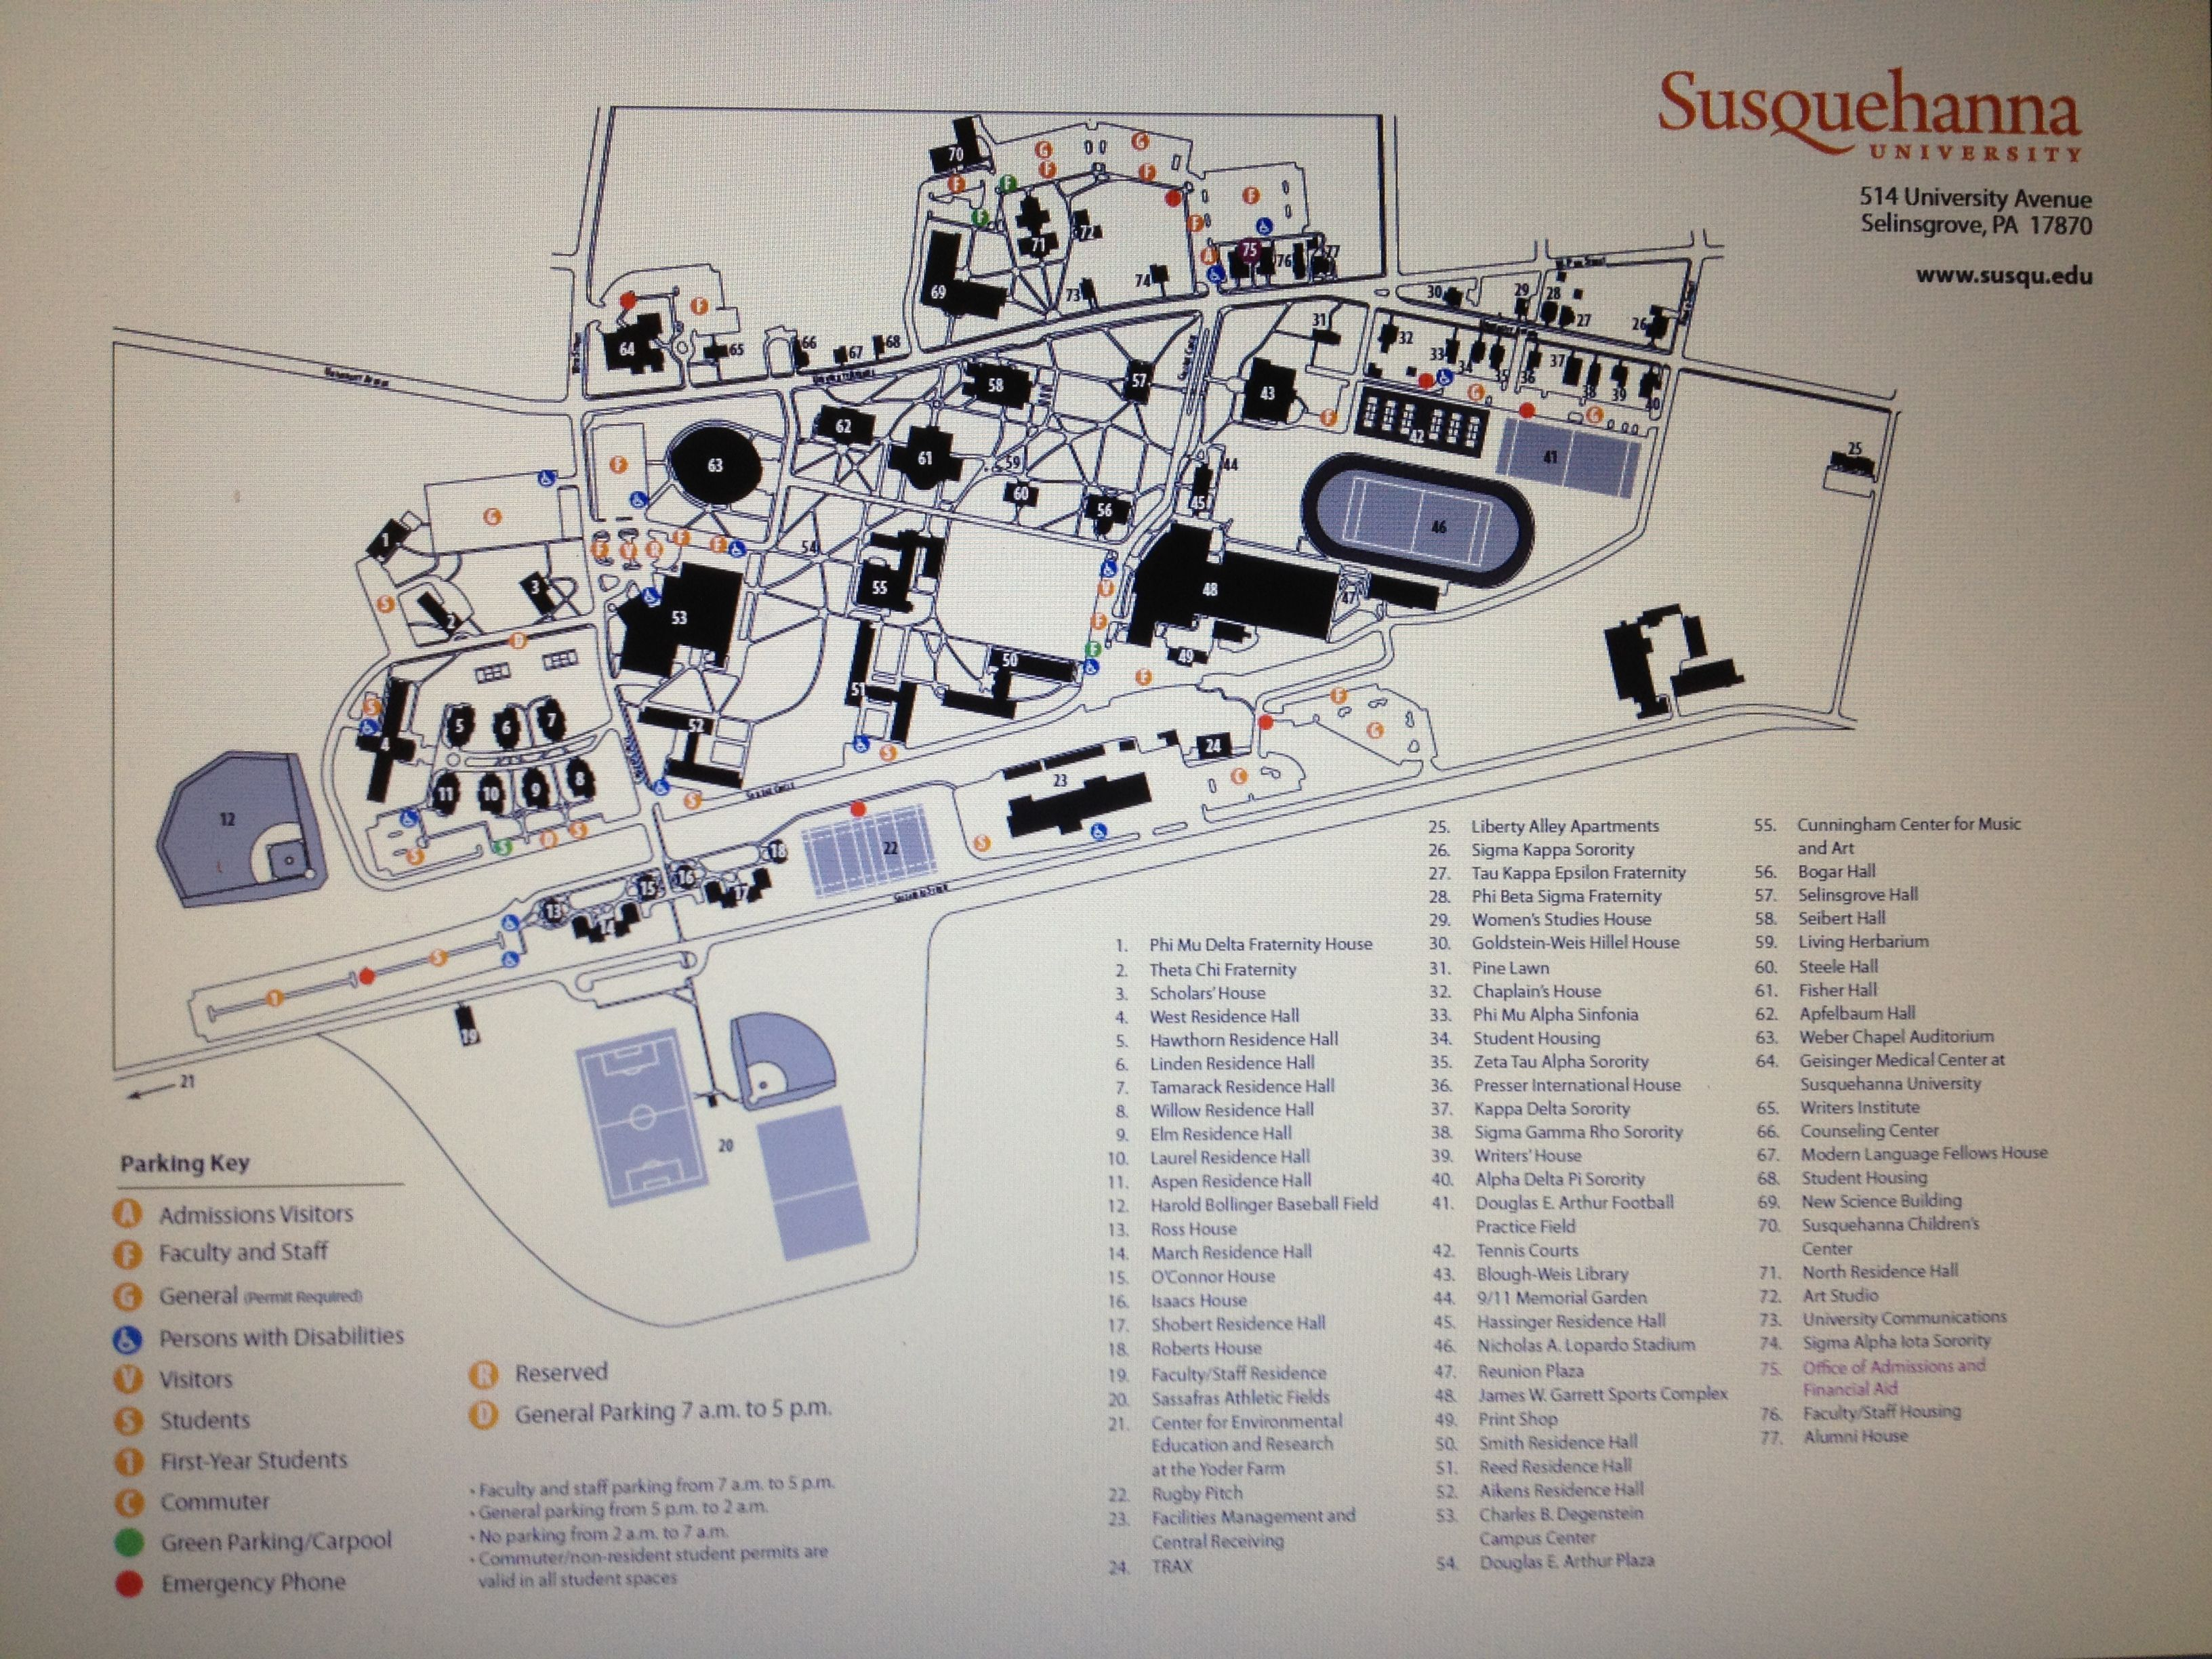 Susquehanna Campus Map.The Susquehanna University Map The Campus Pinterest Event